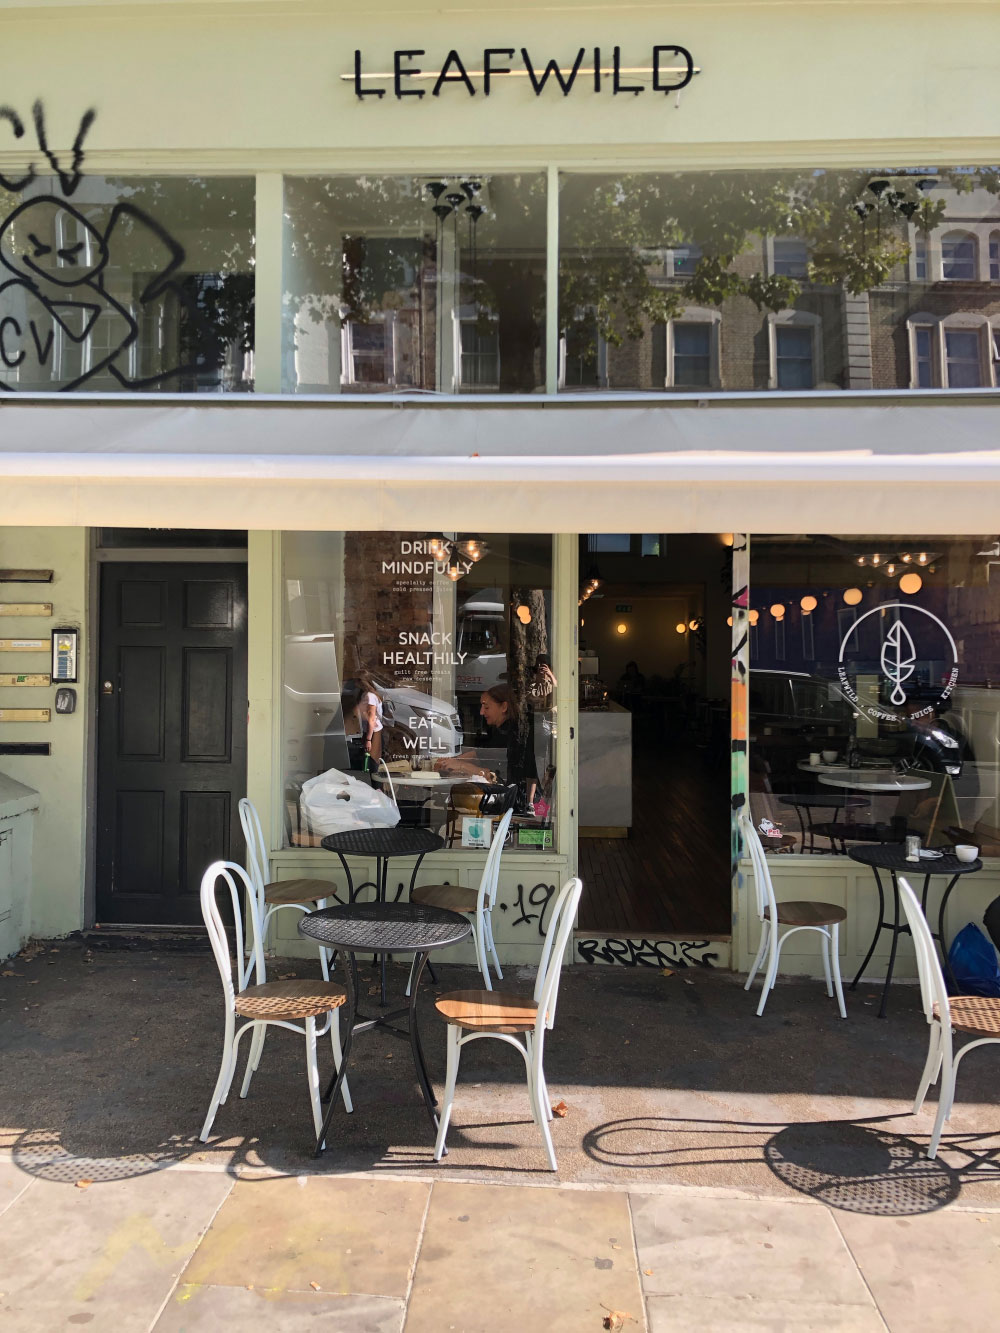 Glowcation Leafwild Cafe Ladbroke Grove